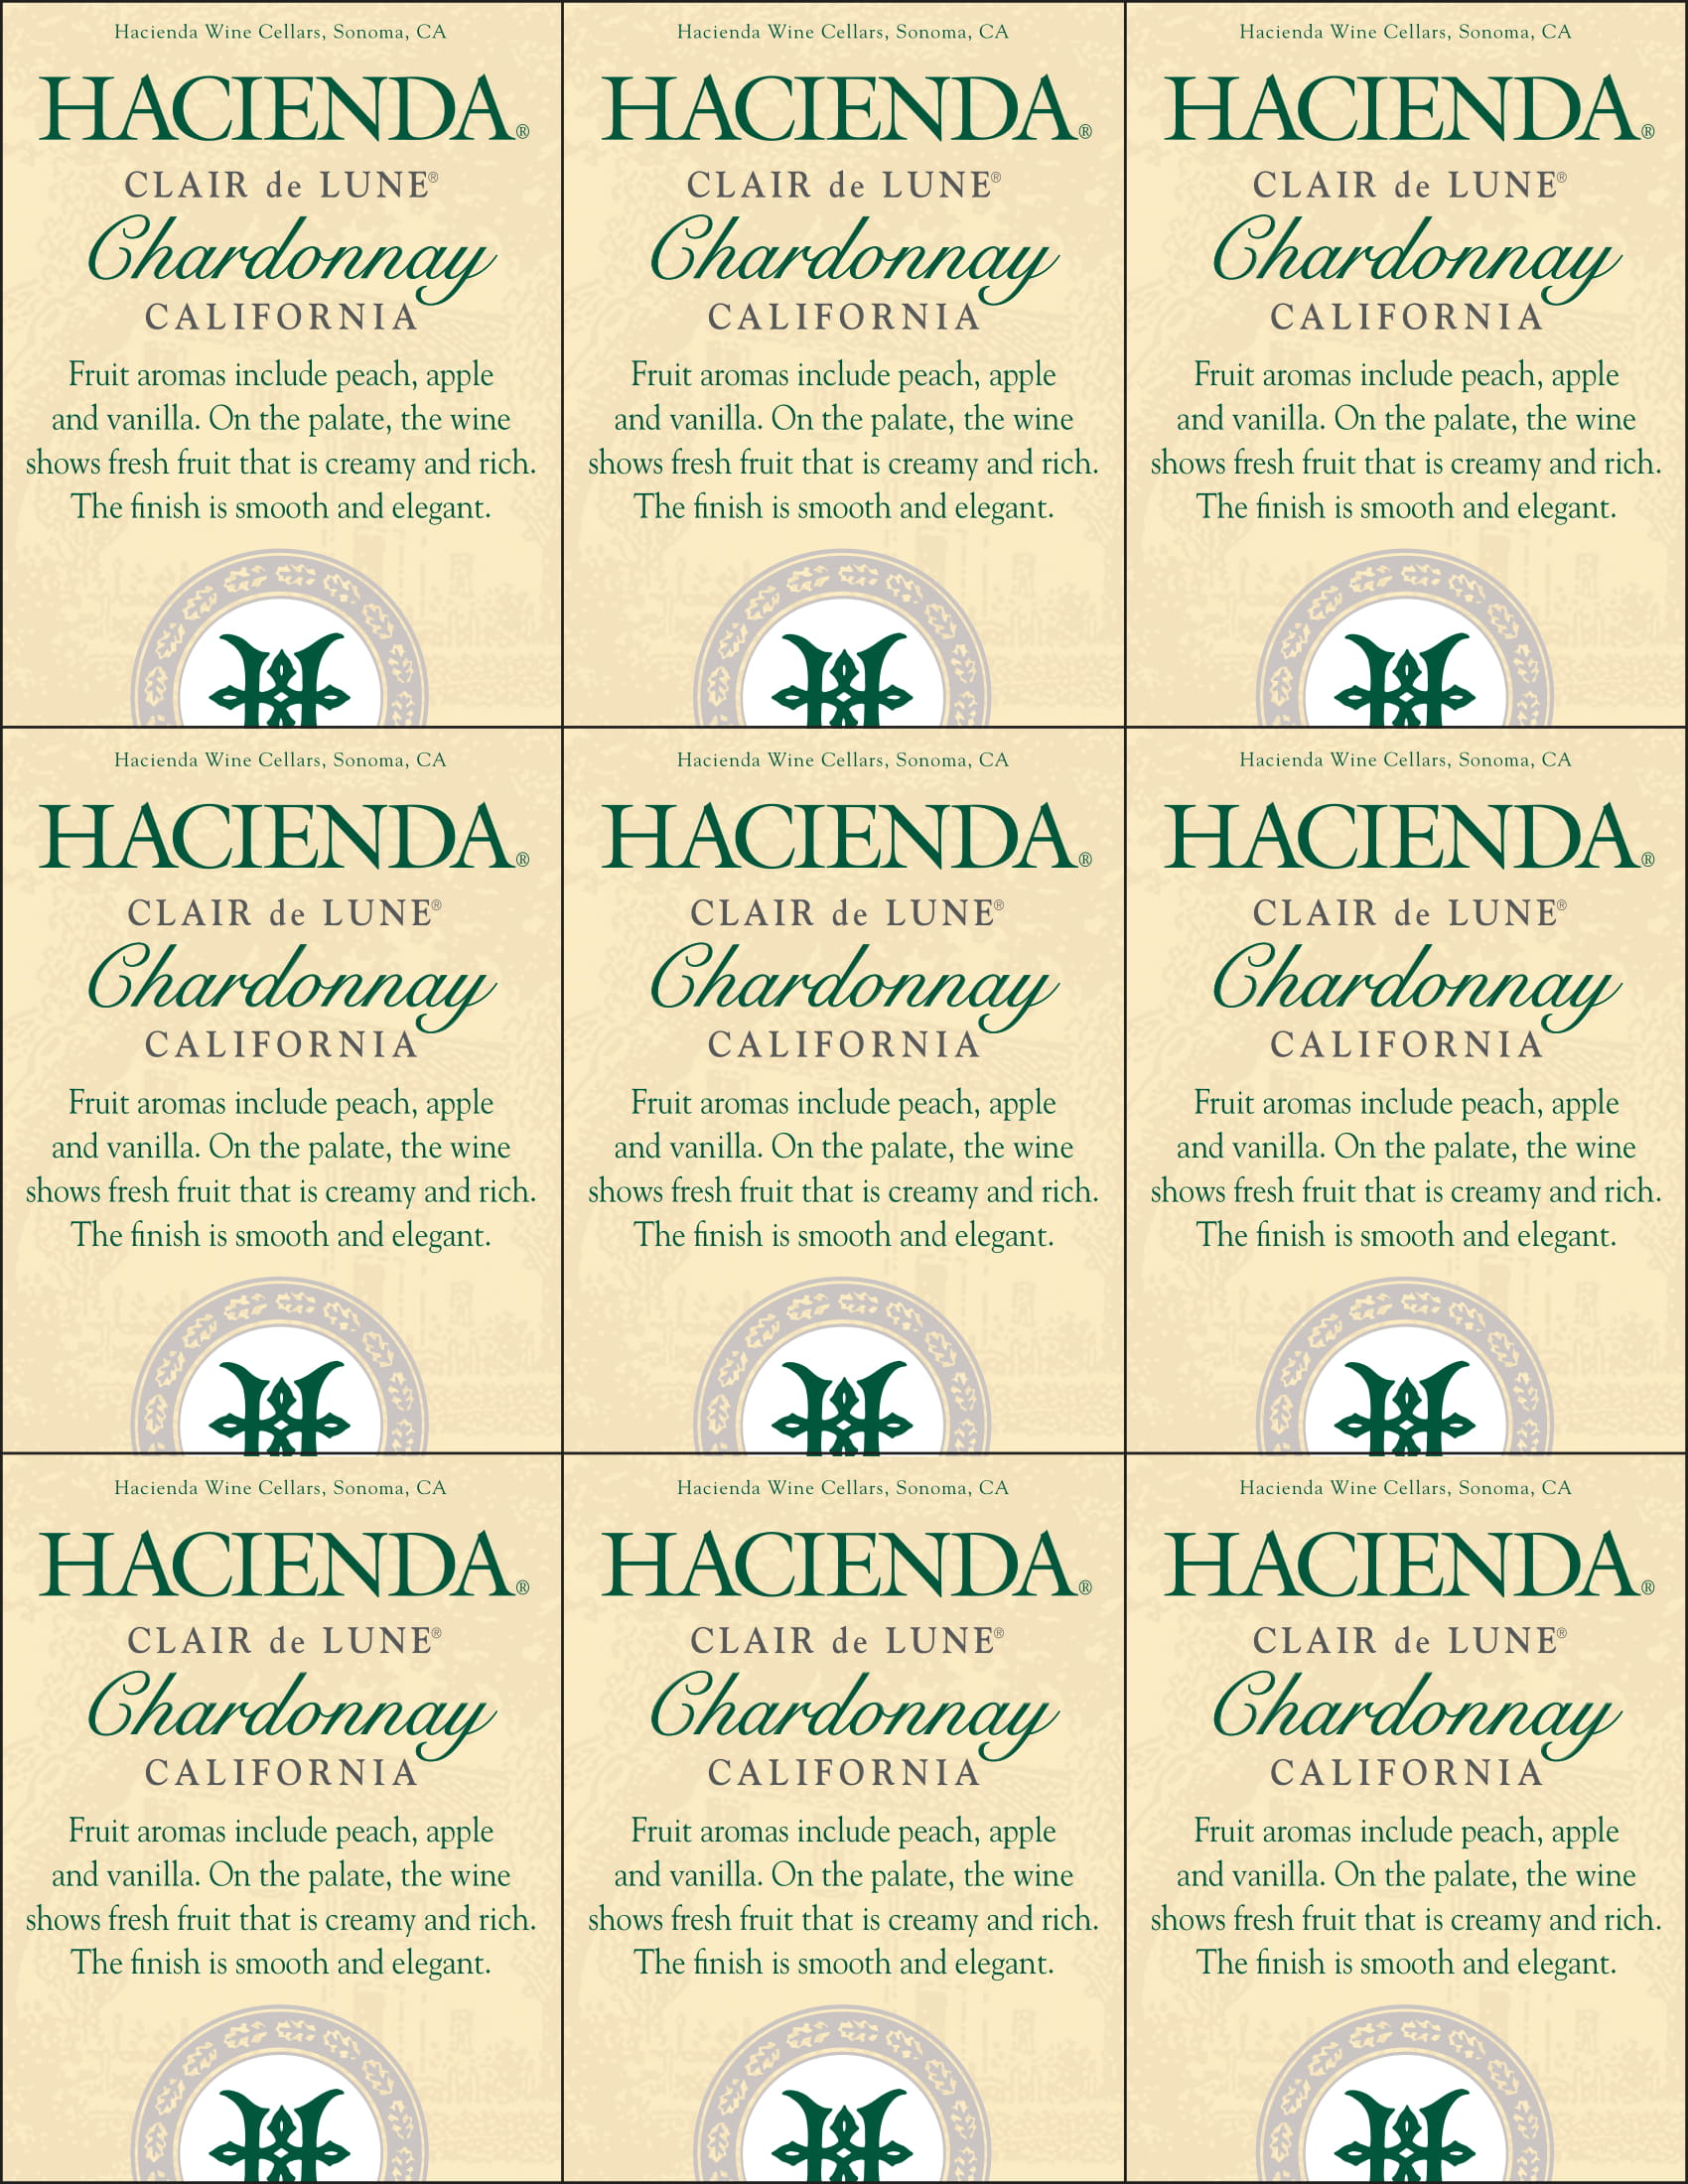 Hacienda Chardonnay Shelf Talker